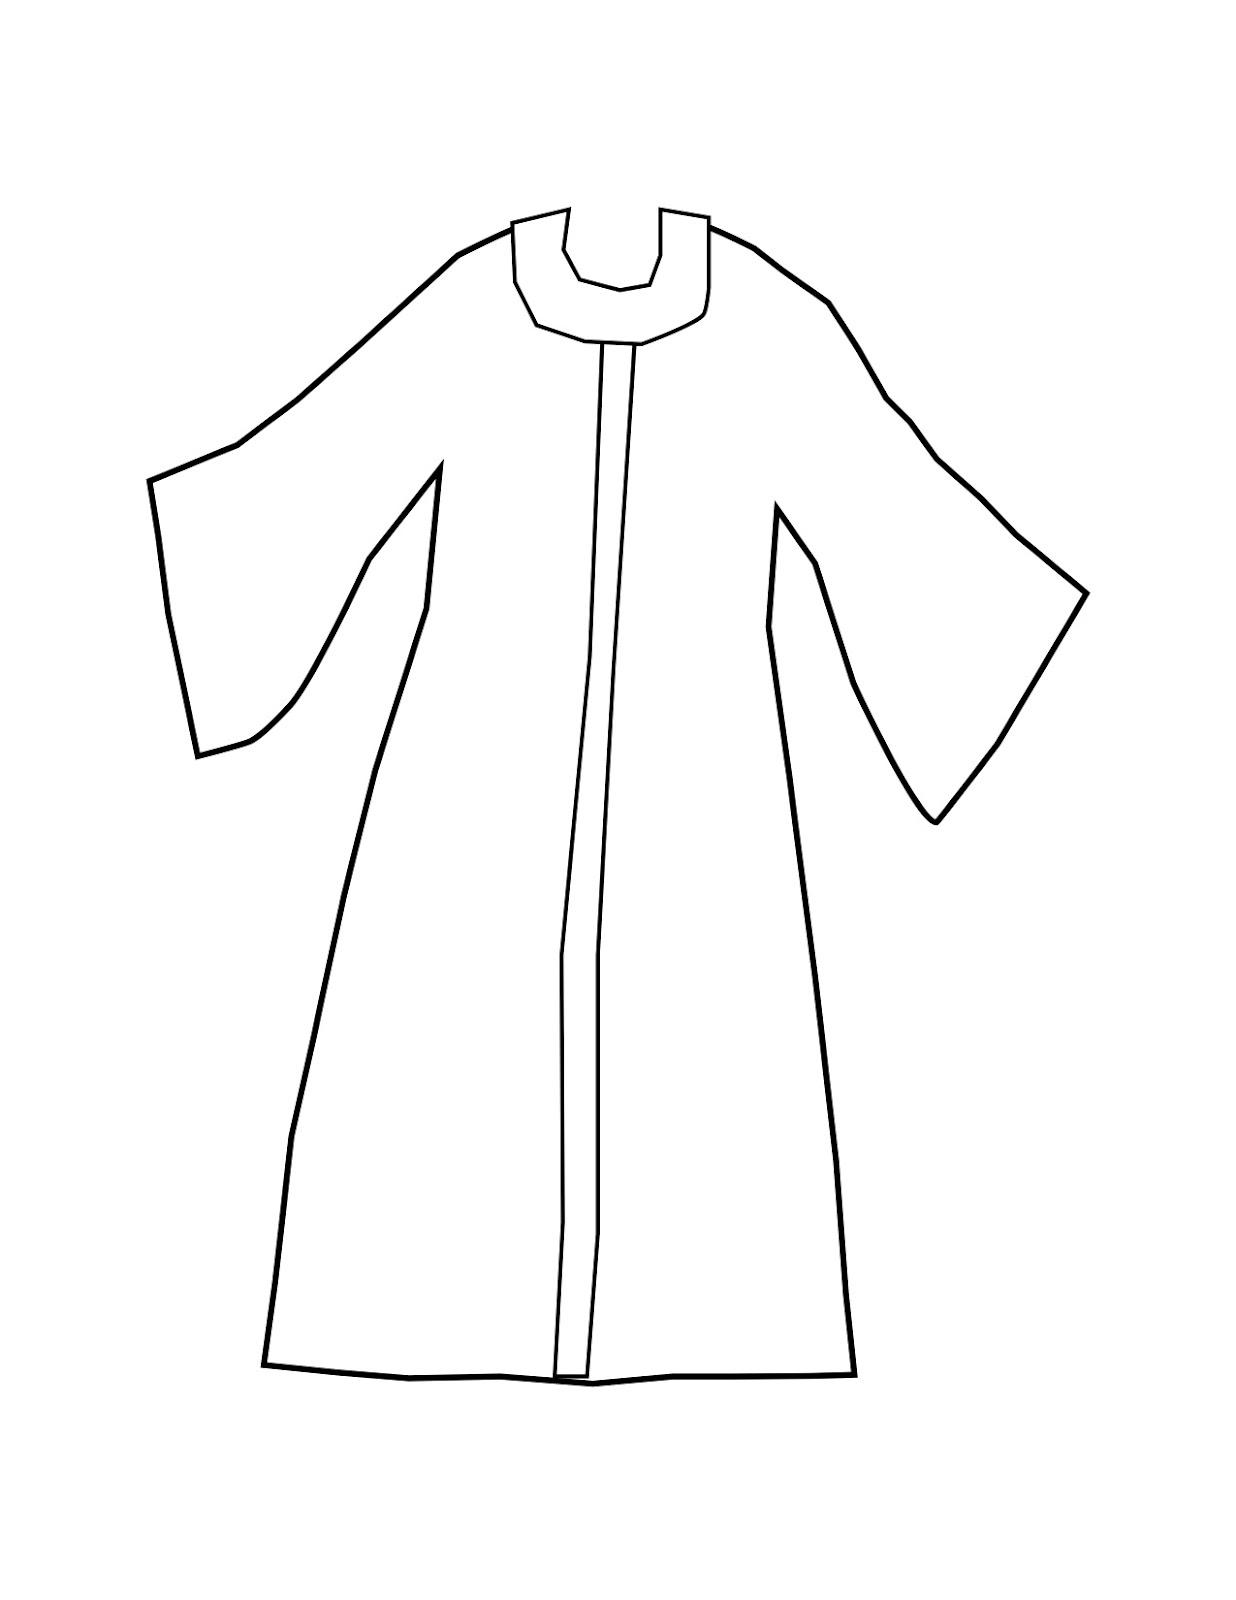 Charlotte S Clips And Kindergarten Kids Joseph S Coat Of